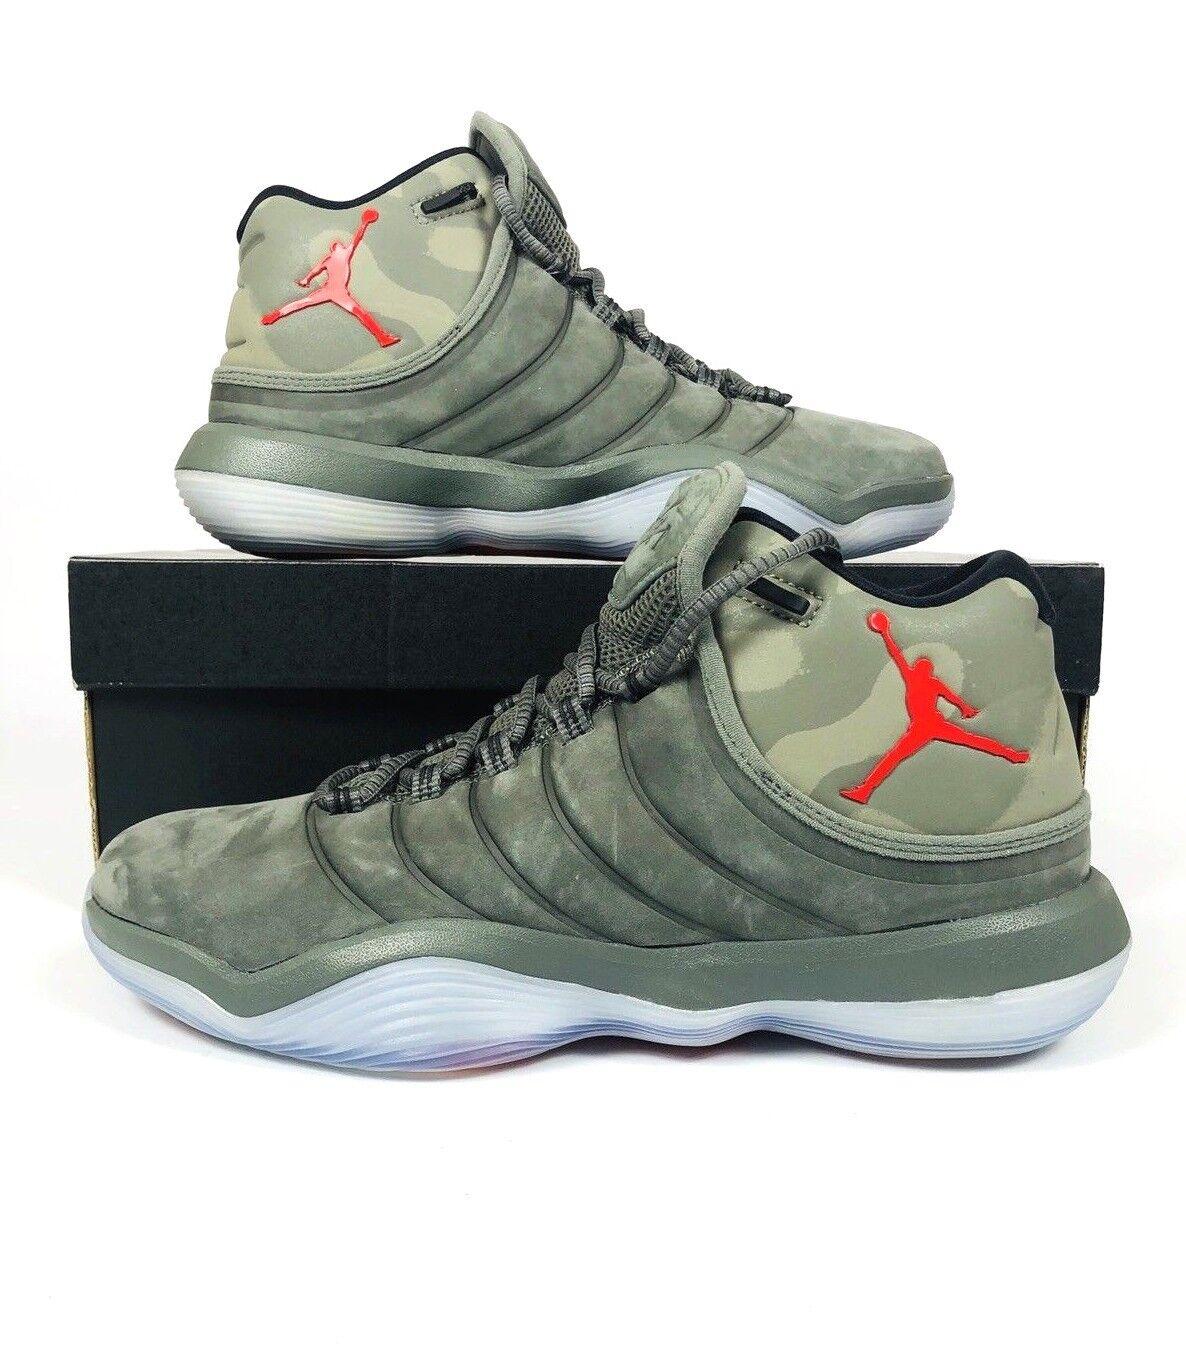 128a272f06533 Nike Air Jordan Jordan Jordan Superfly 2017 Men s Basketball shoes 921203-051  Size 8 8a8298